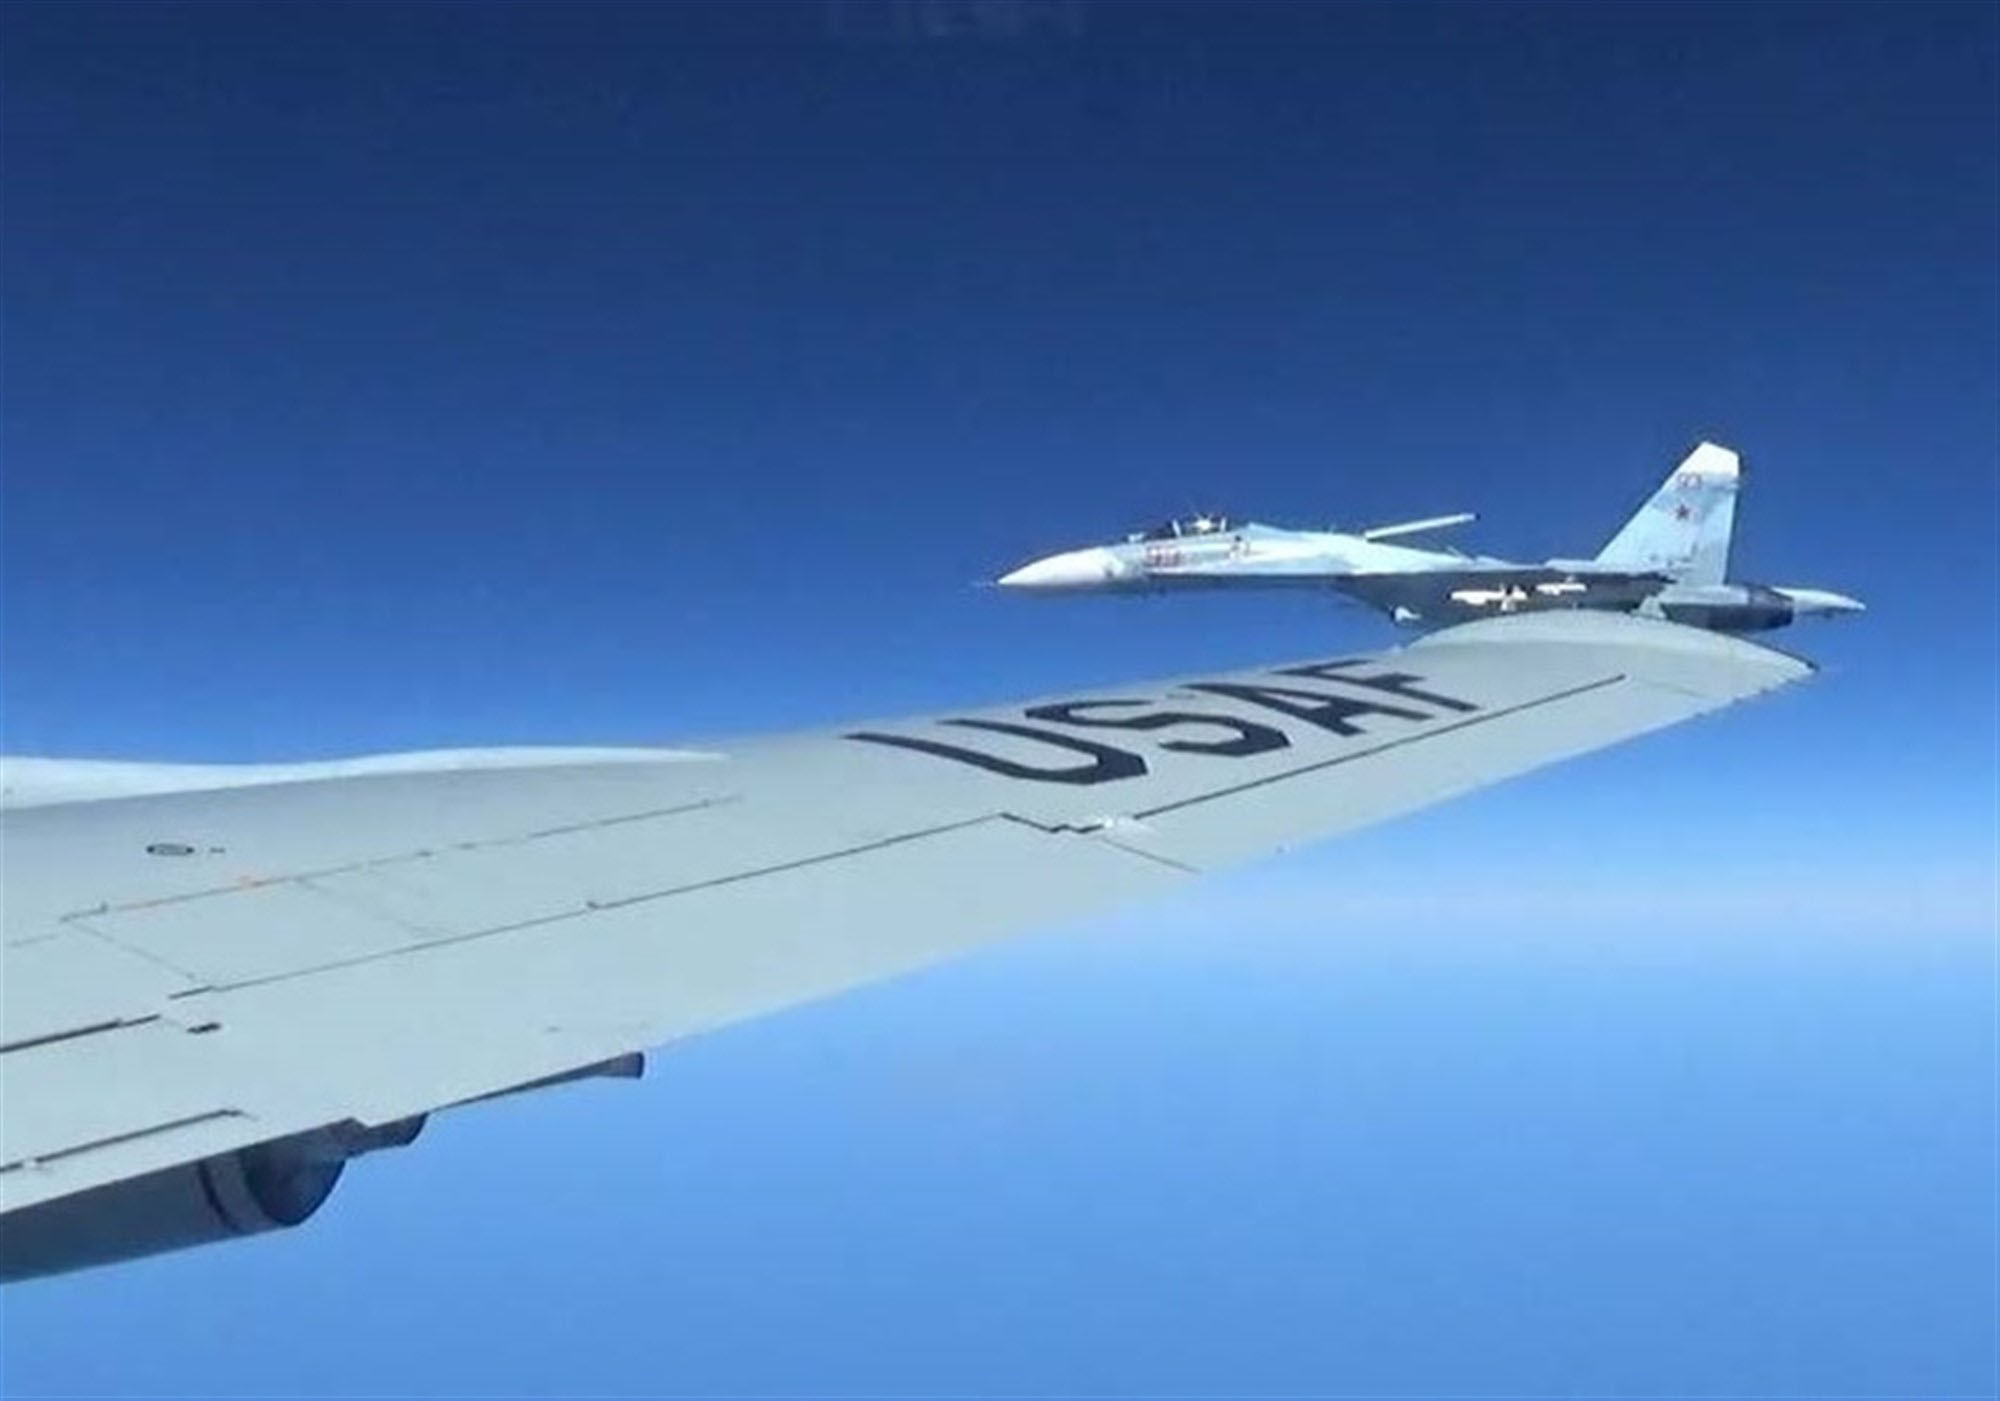 RC-135U,驅逐艦,偵察機,南海,巴士海峽,戰機,長江口,解放軍,媒體,美中關係